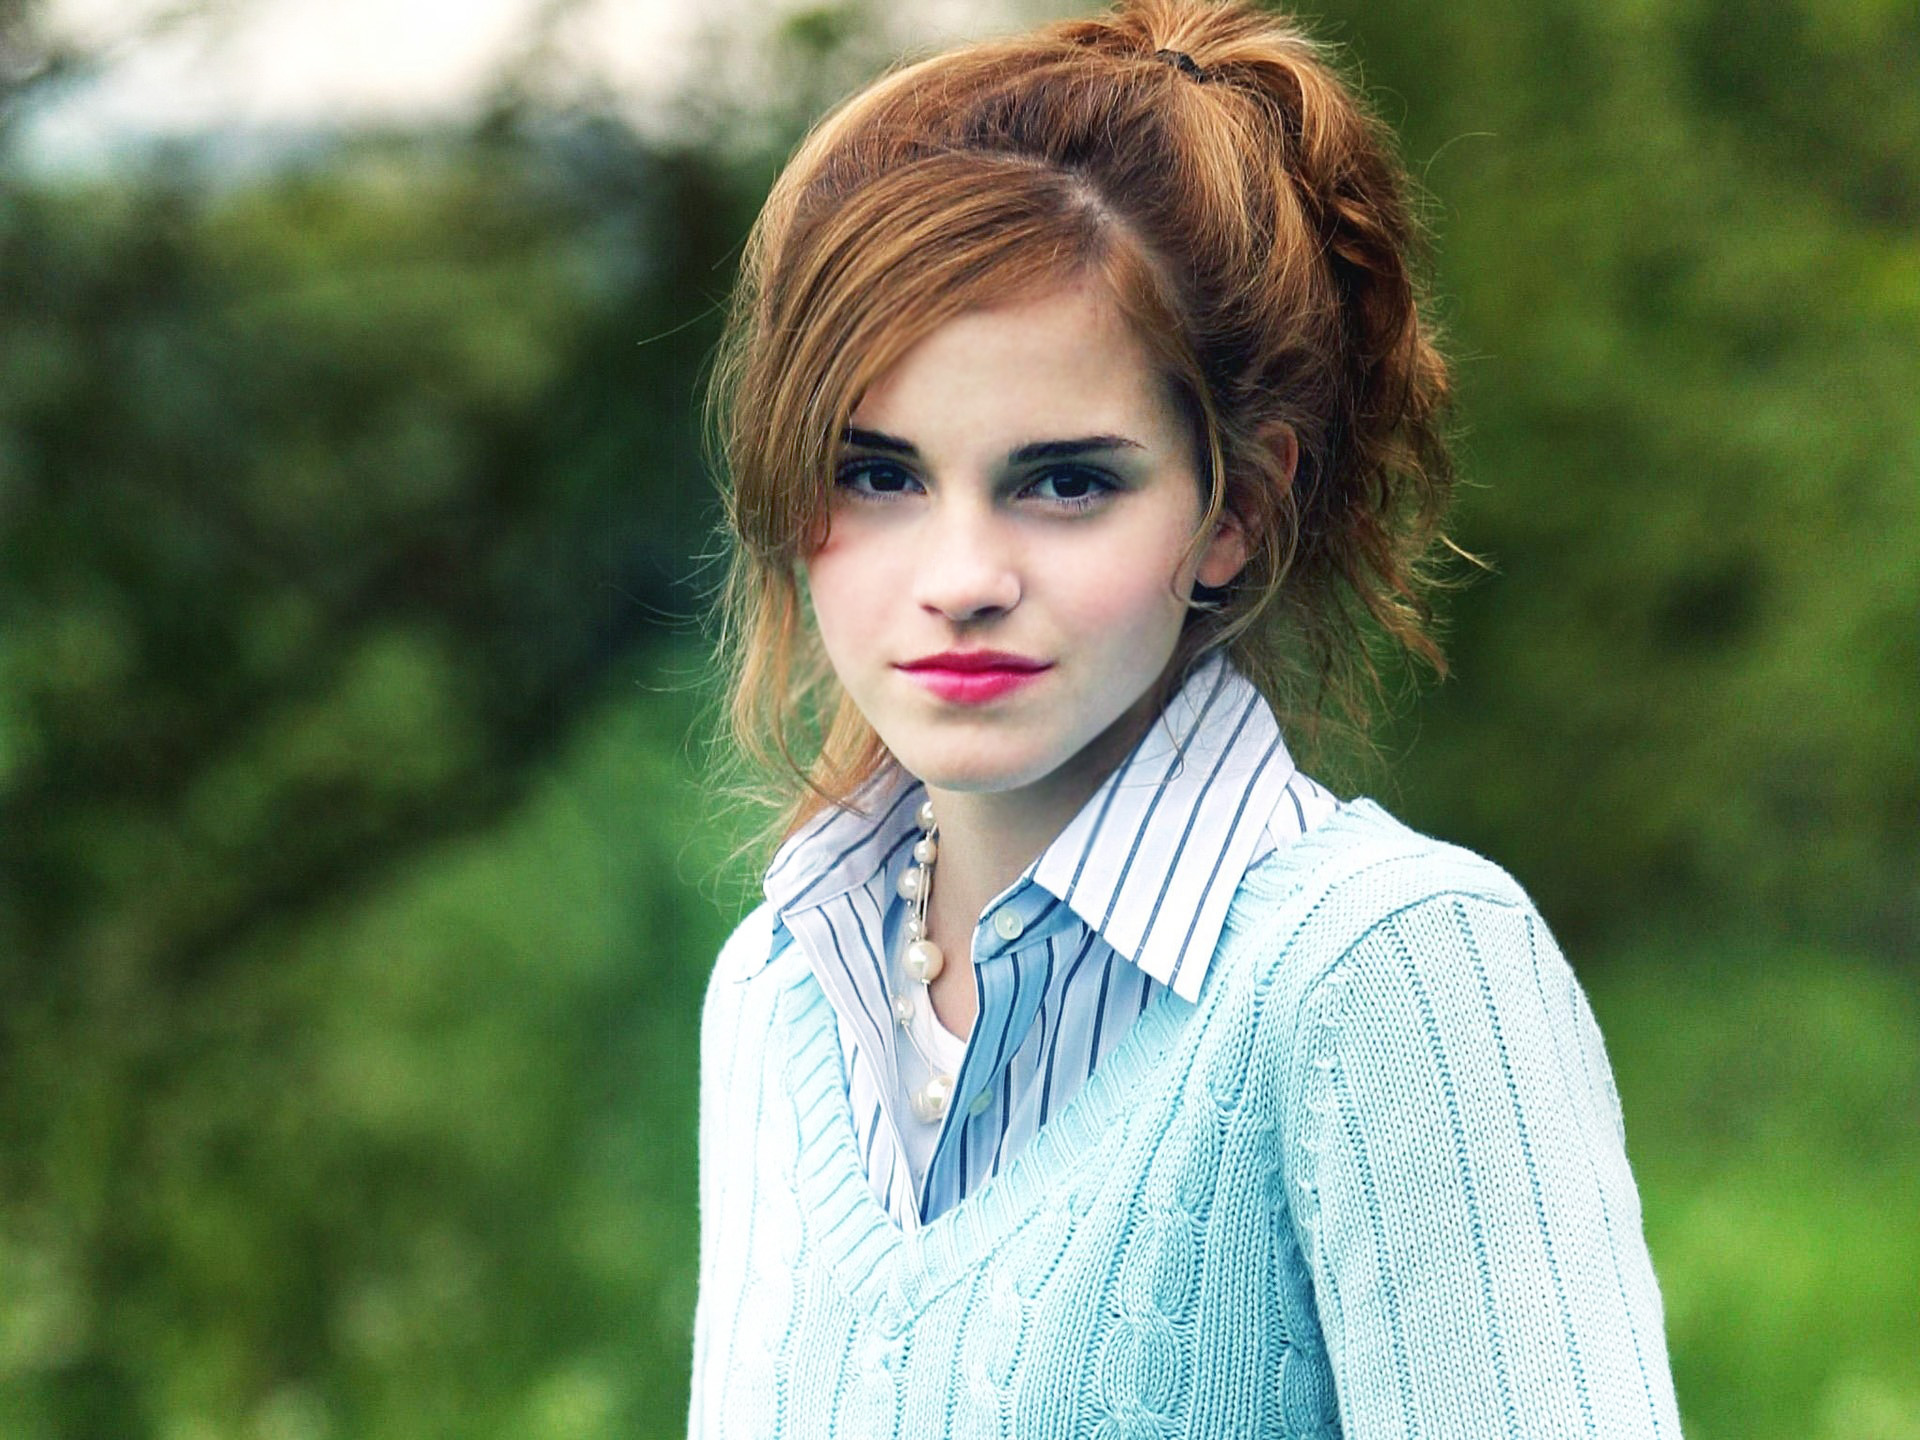 Beautiful Emma Watson - Wallpaper, High Definition, High